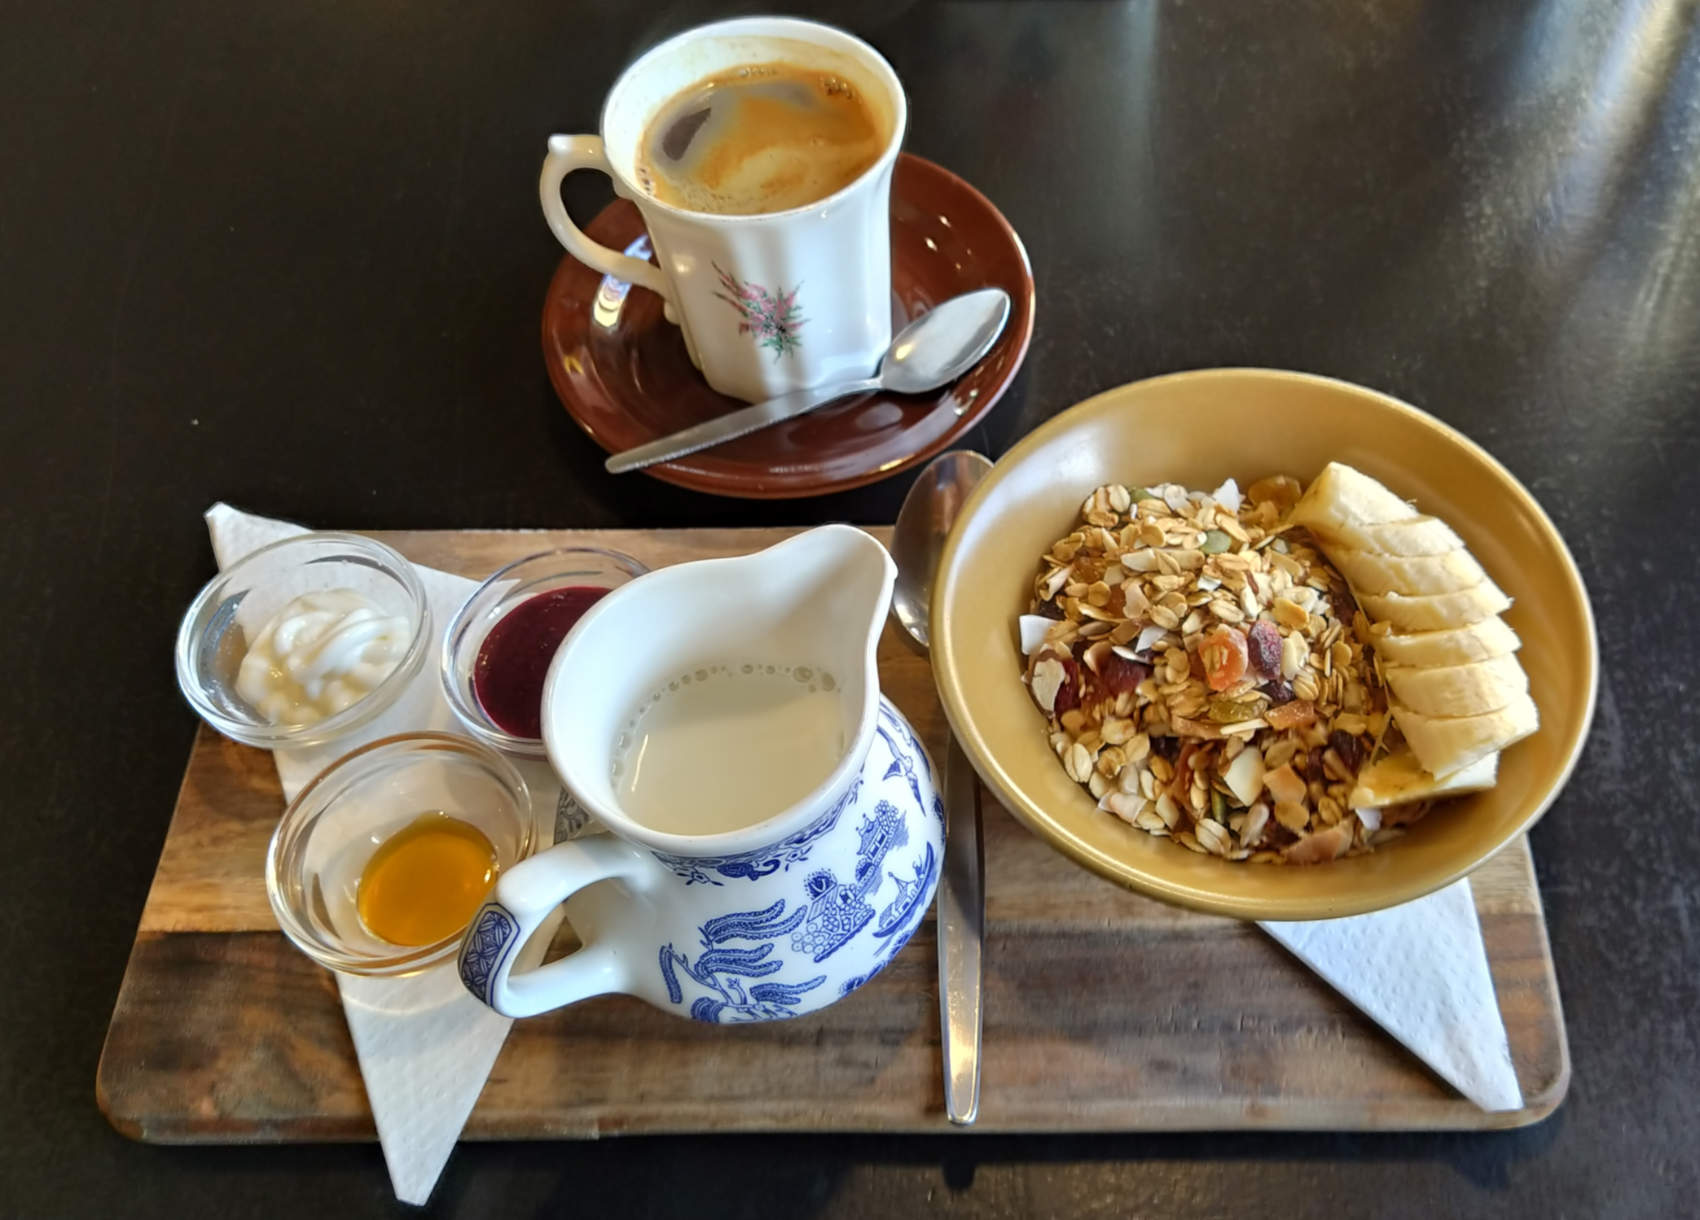 Preservatorium muesli and coffee